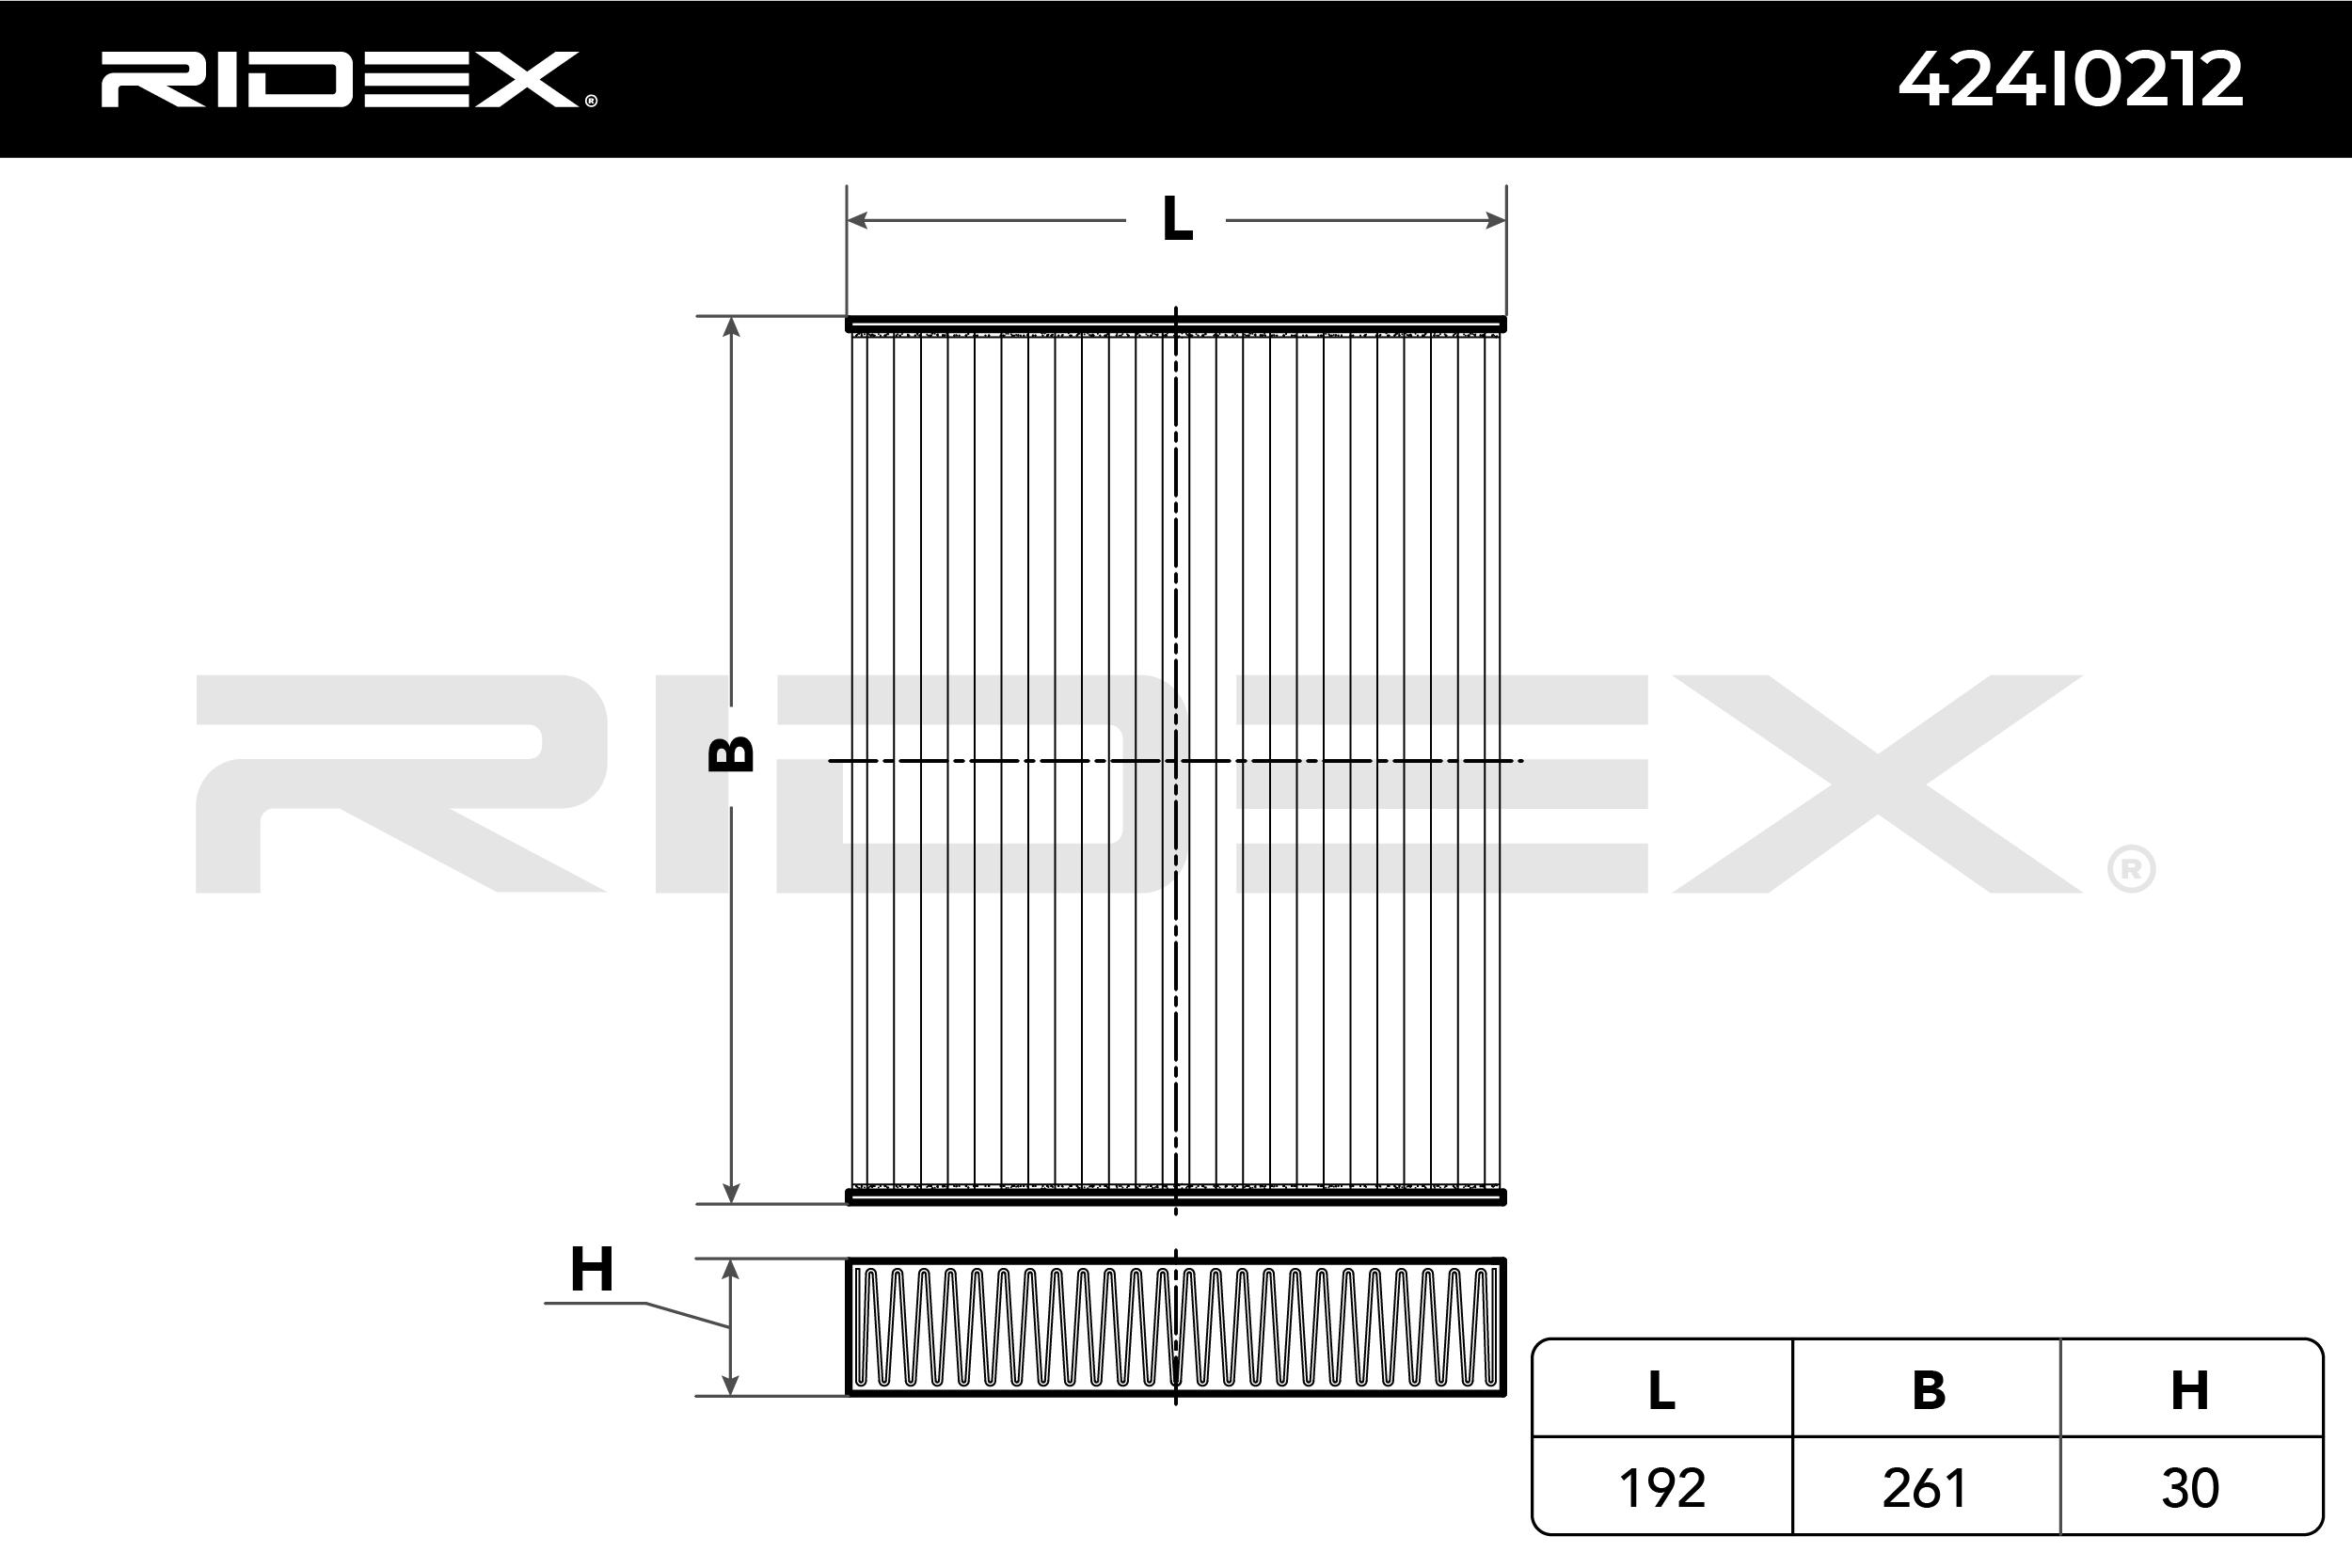 NISSAN TRADE 1998 Klimafilter - Original RIDEX 424I0212 Breite: 261mm, Höhe: 30mm, Länge: 192mm